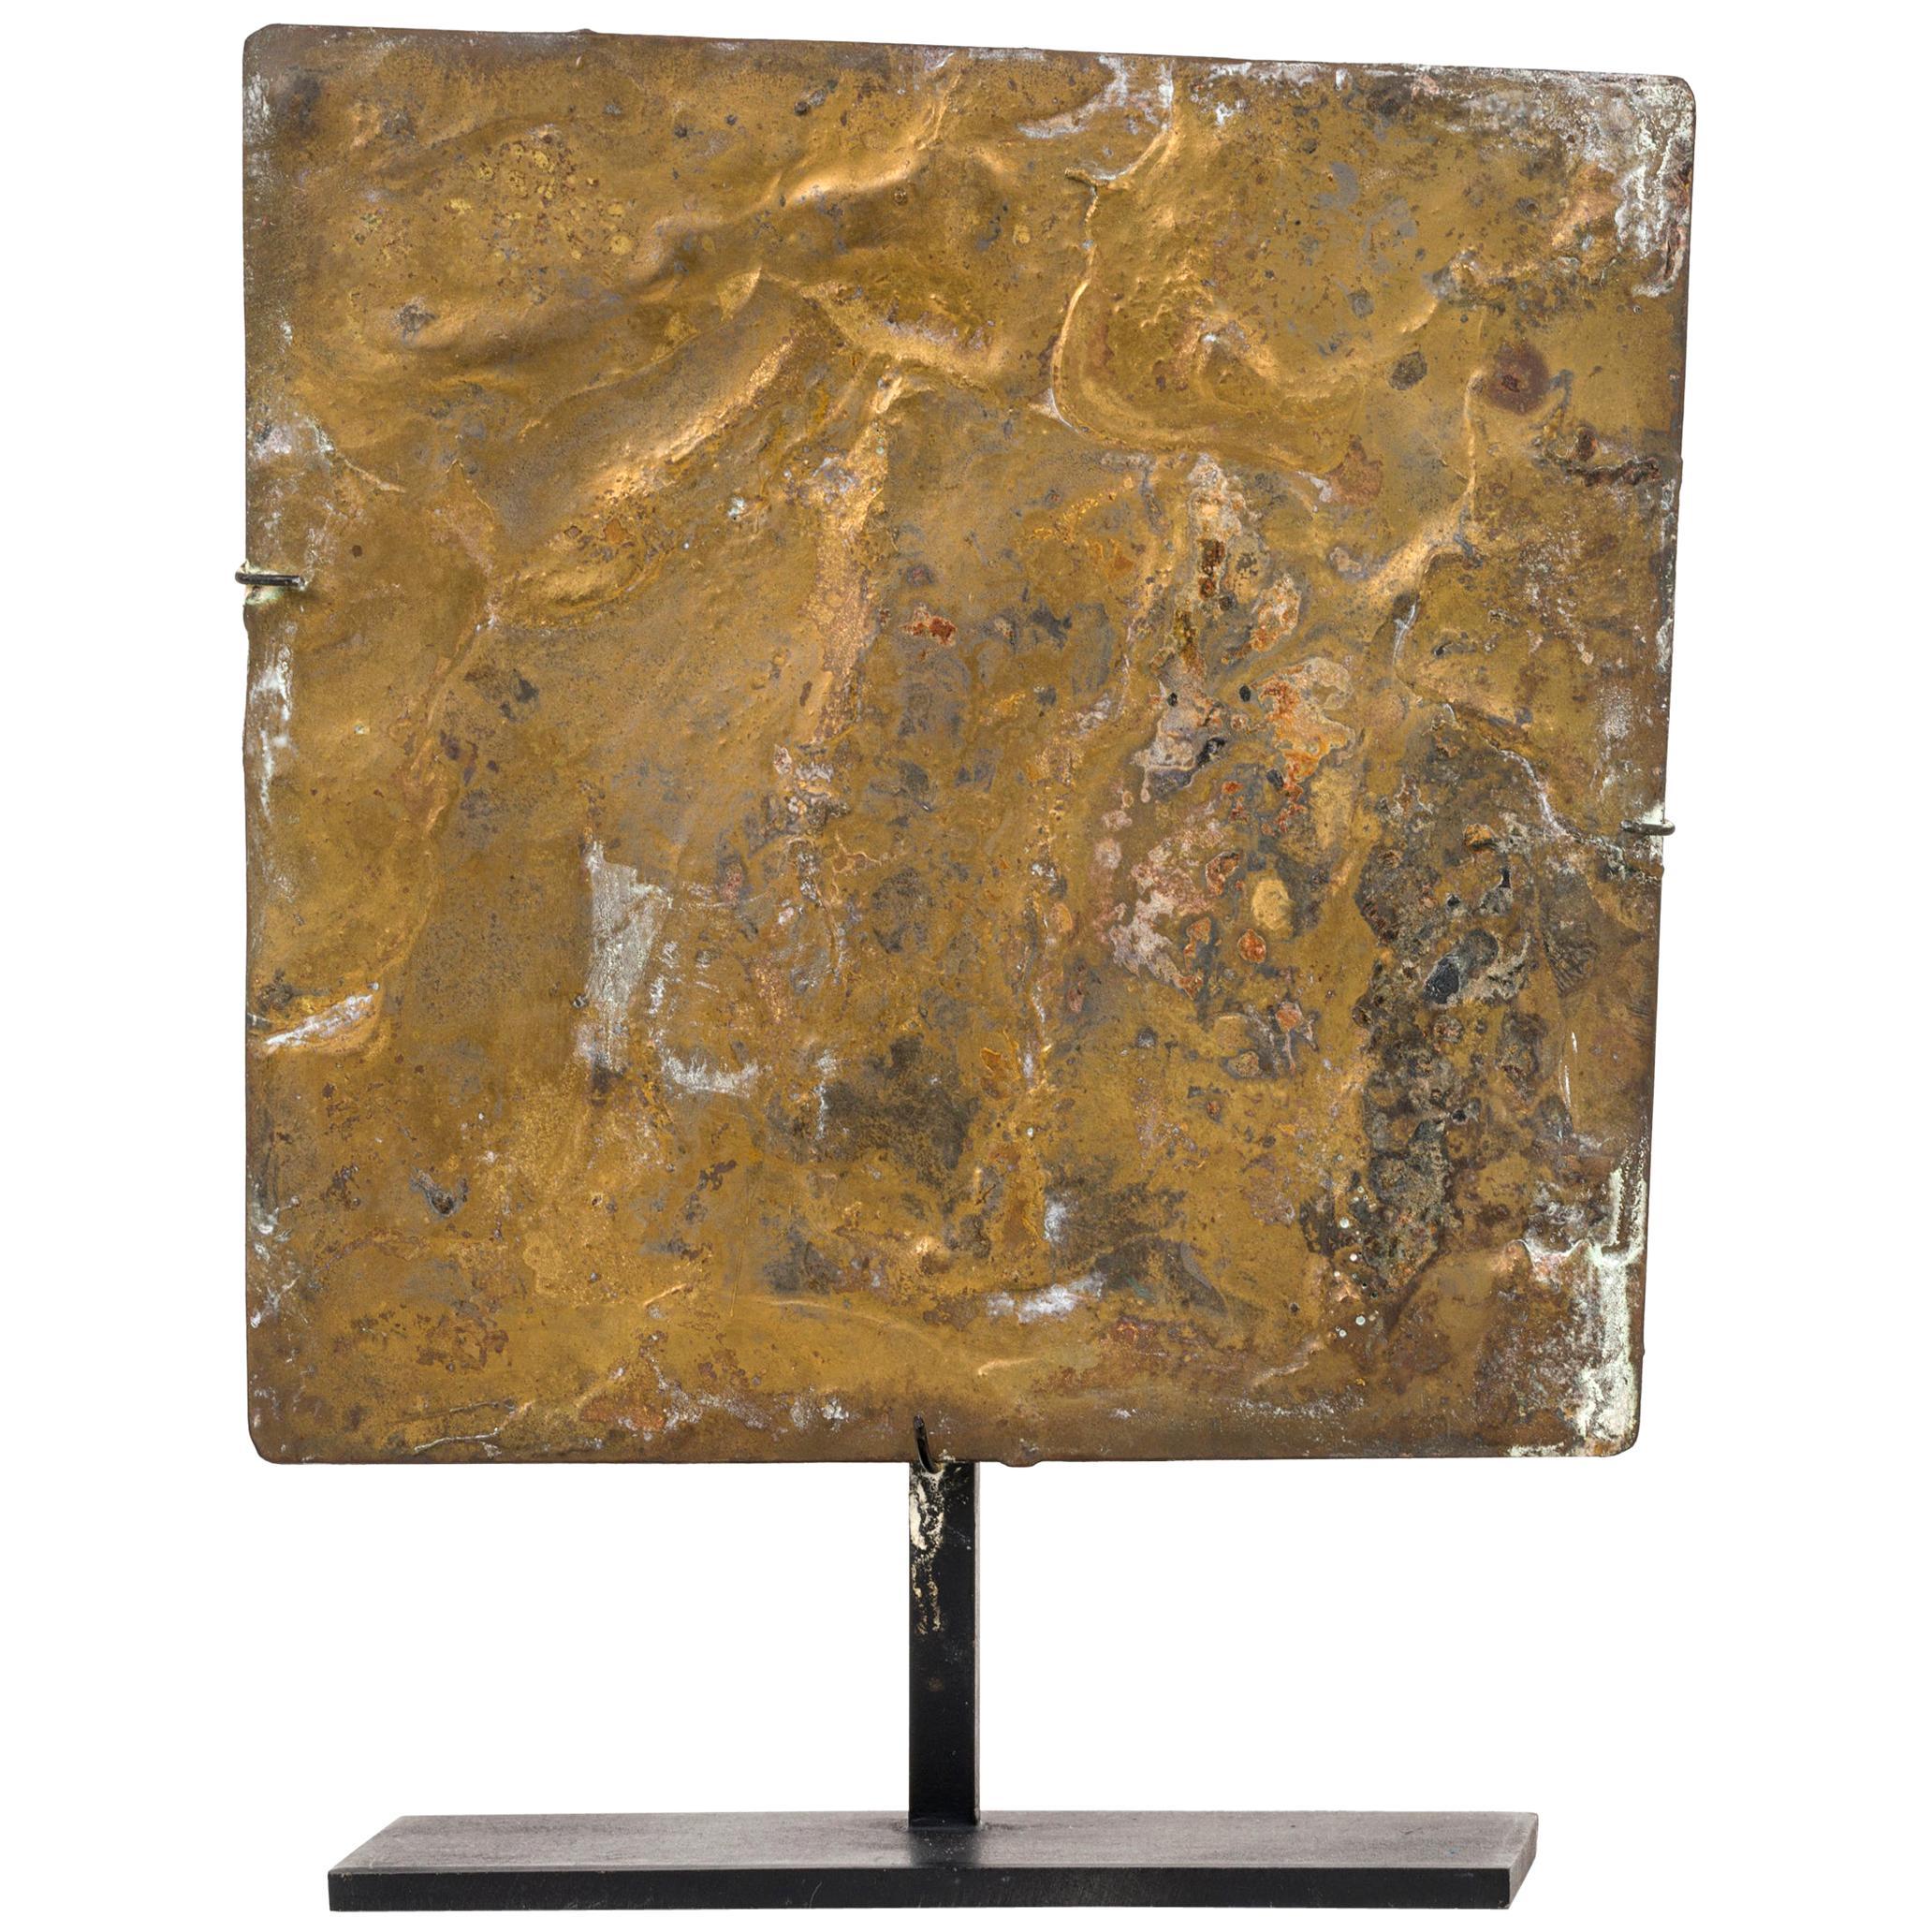 Harry Bertoia Brass Melt Coated Sculptural Panel